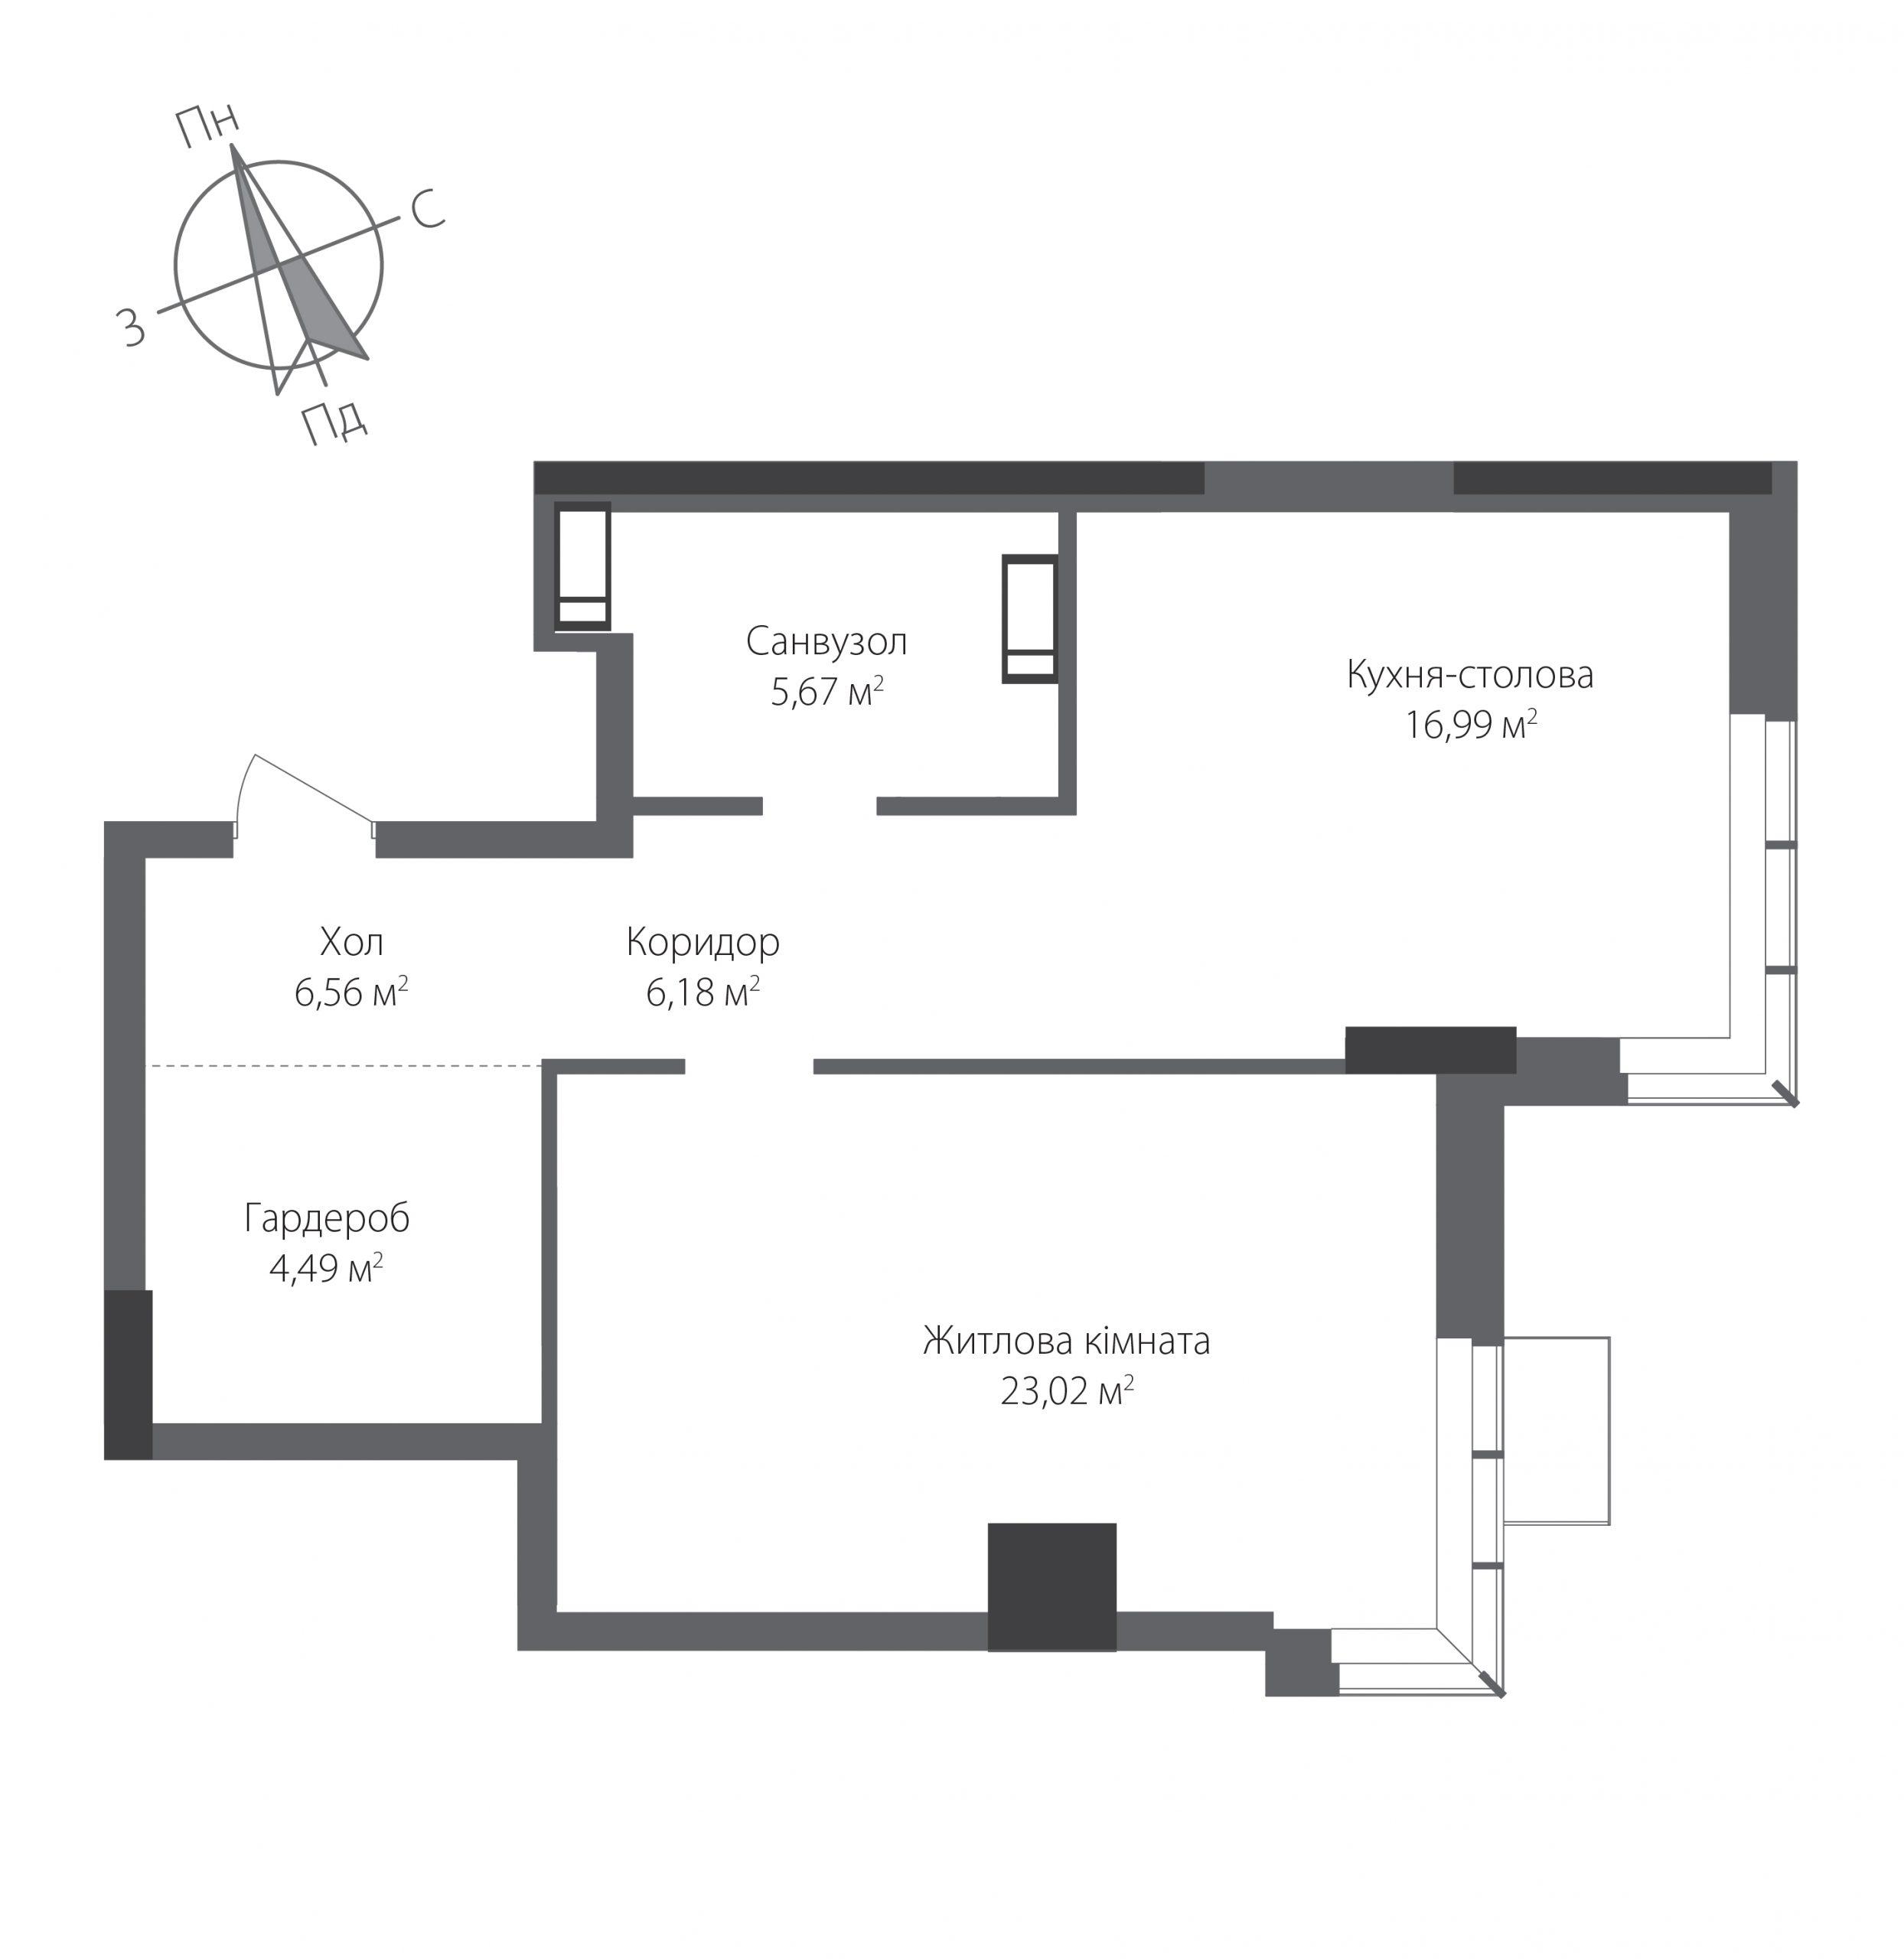 Номер квартири №1201, Будинок 9, Поверх 12, Повна площа 62,91